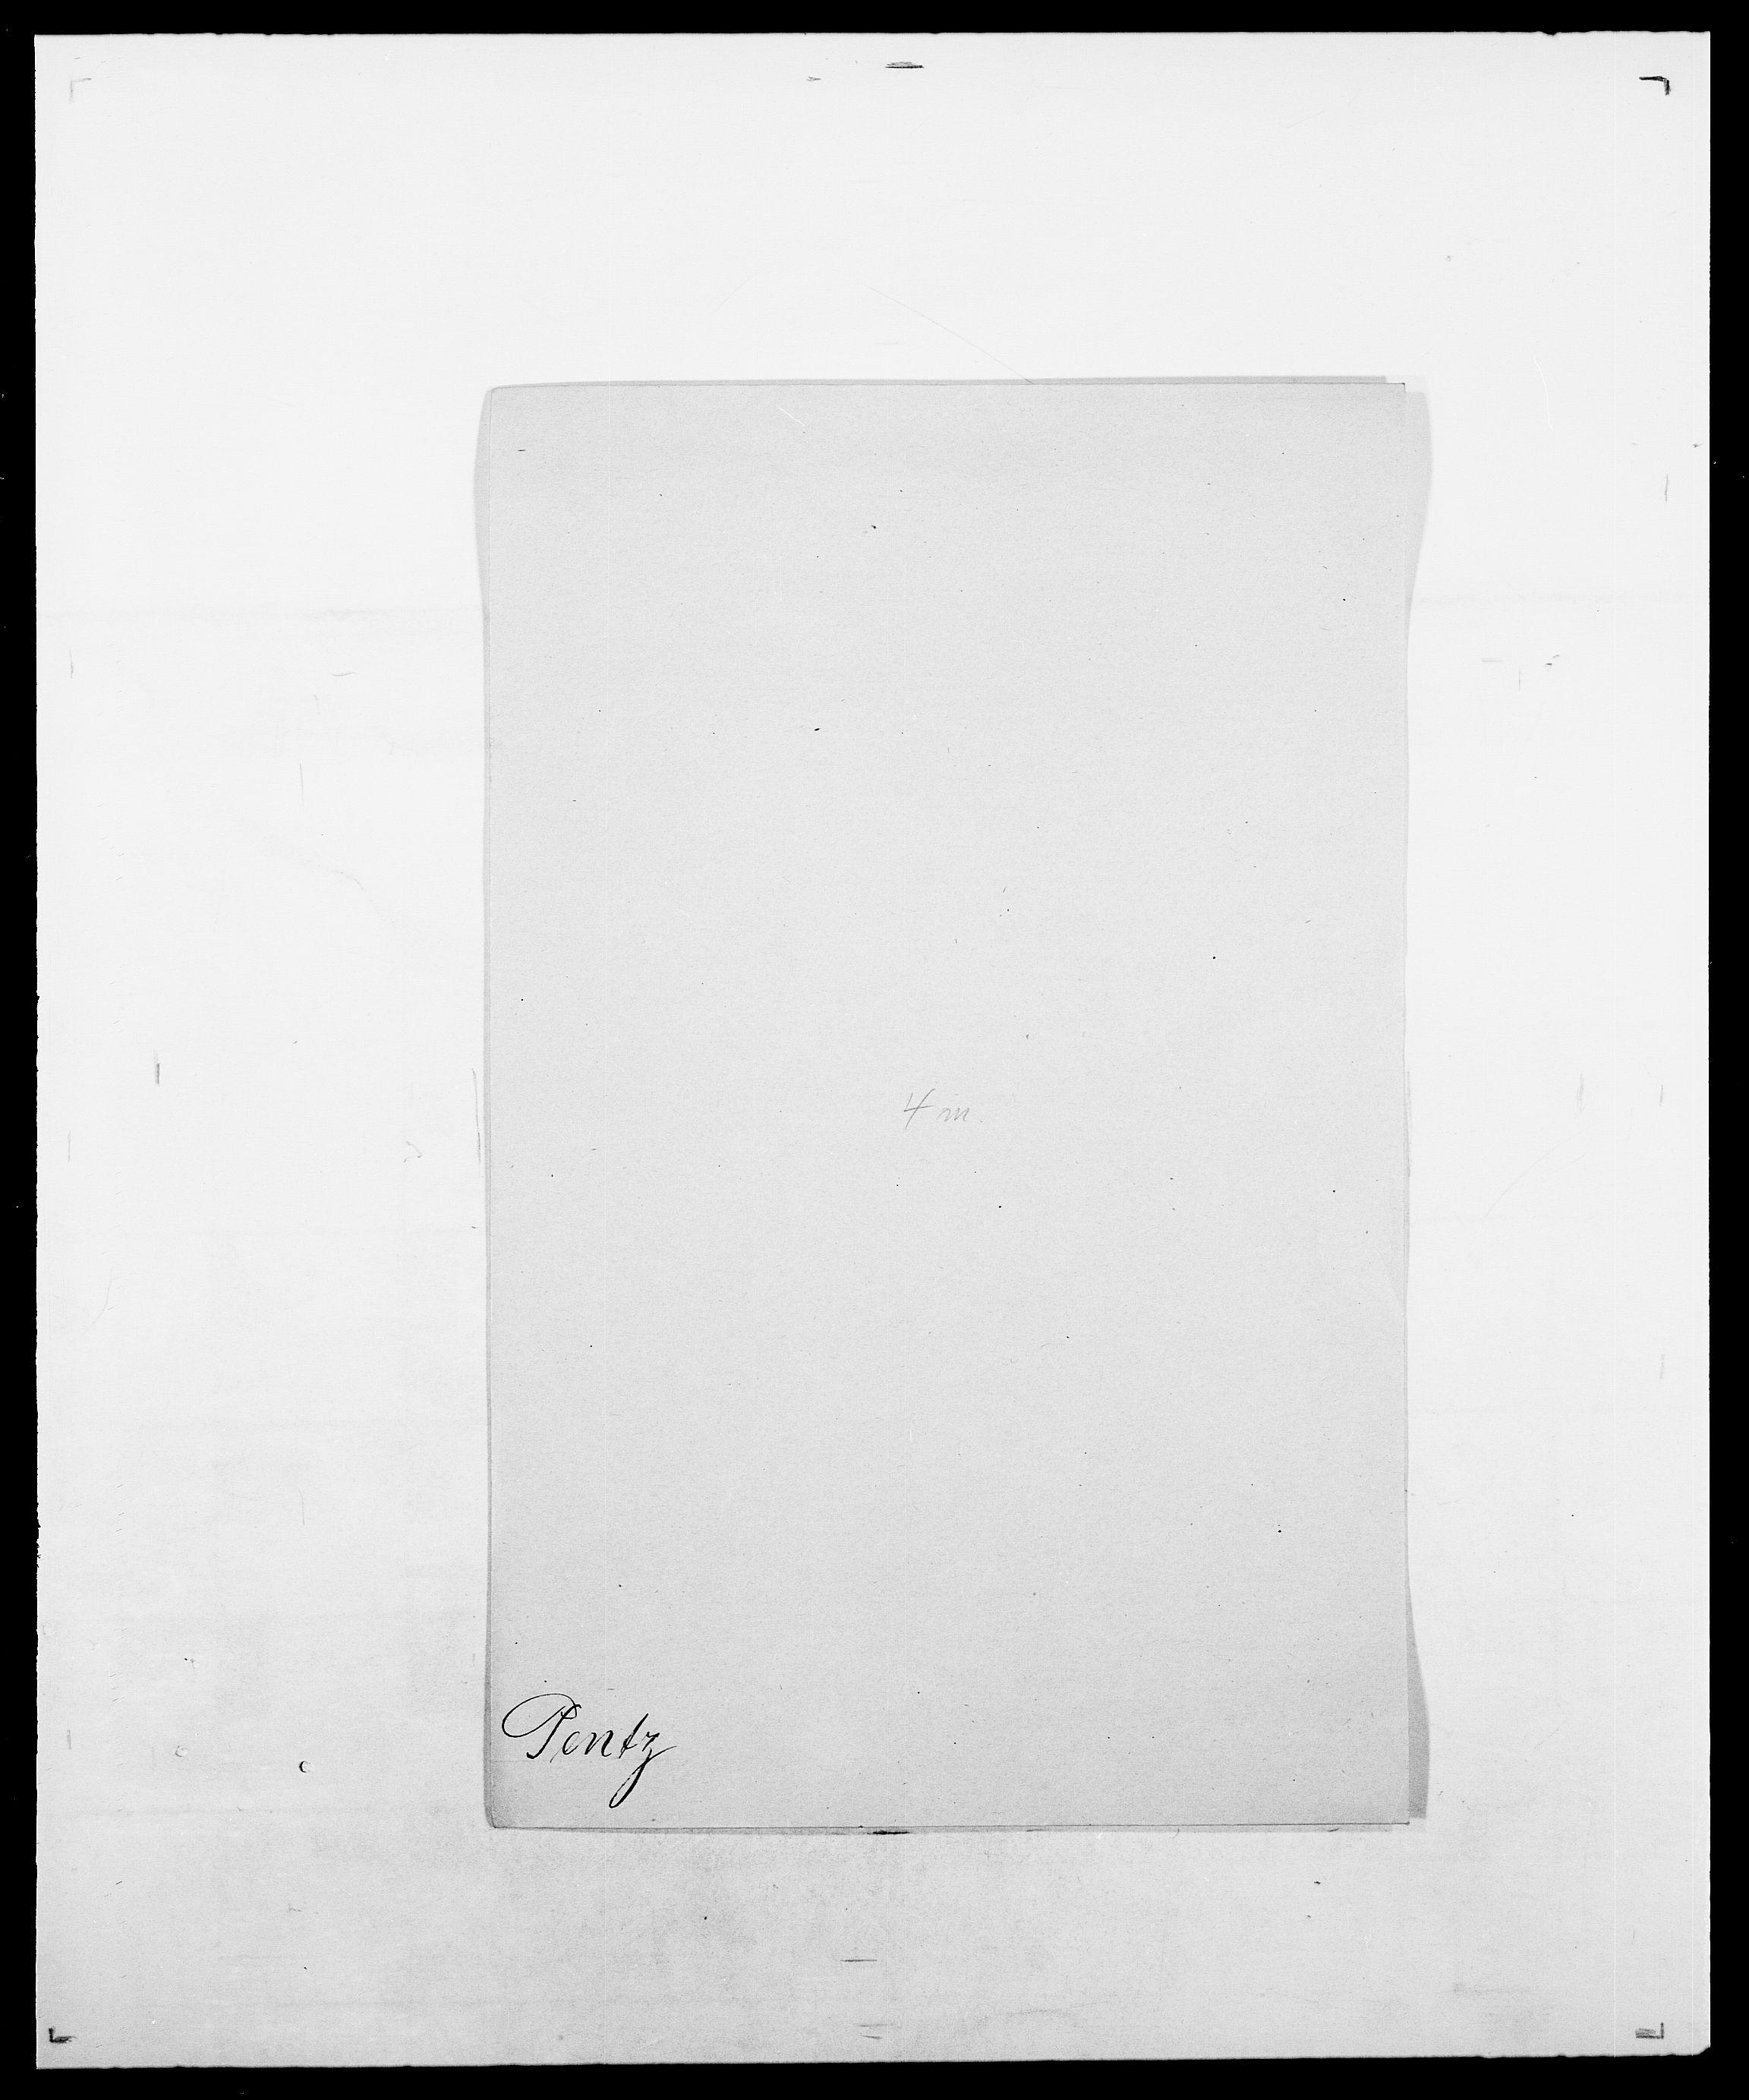 SAO, Delgobe, Charles Antoine - samling, D/Da/L0030: Paars - Pittelkov, s. 351